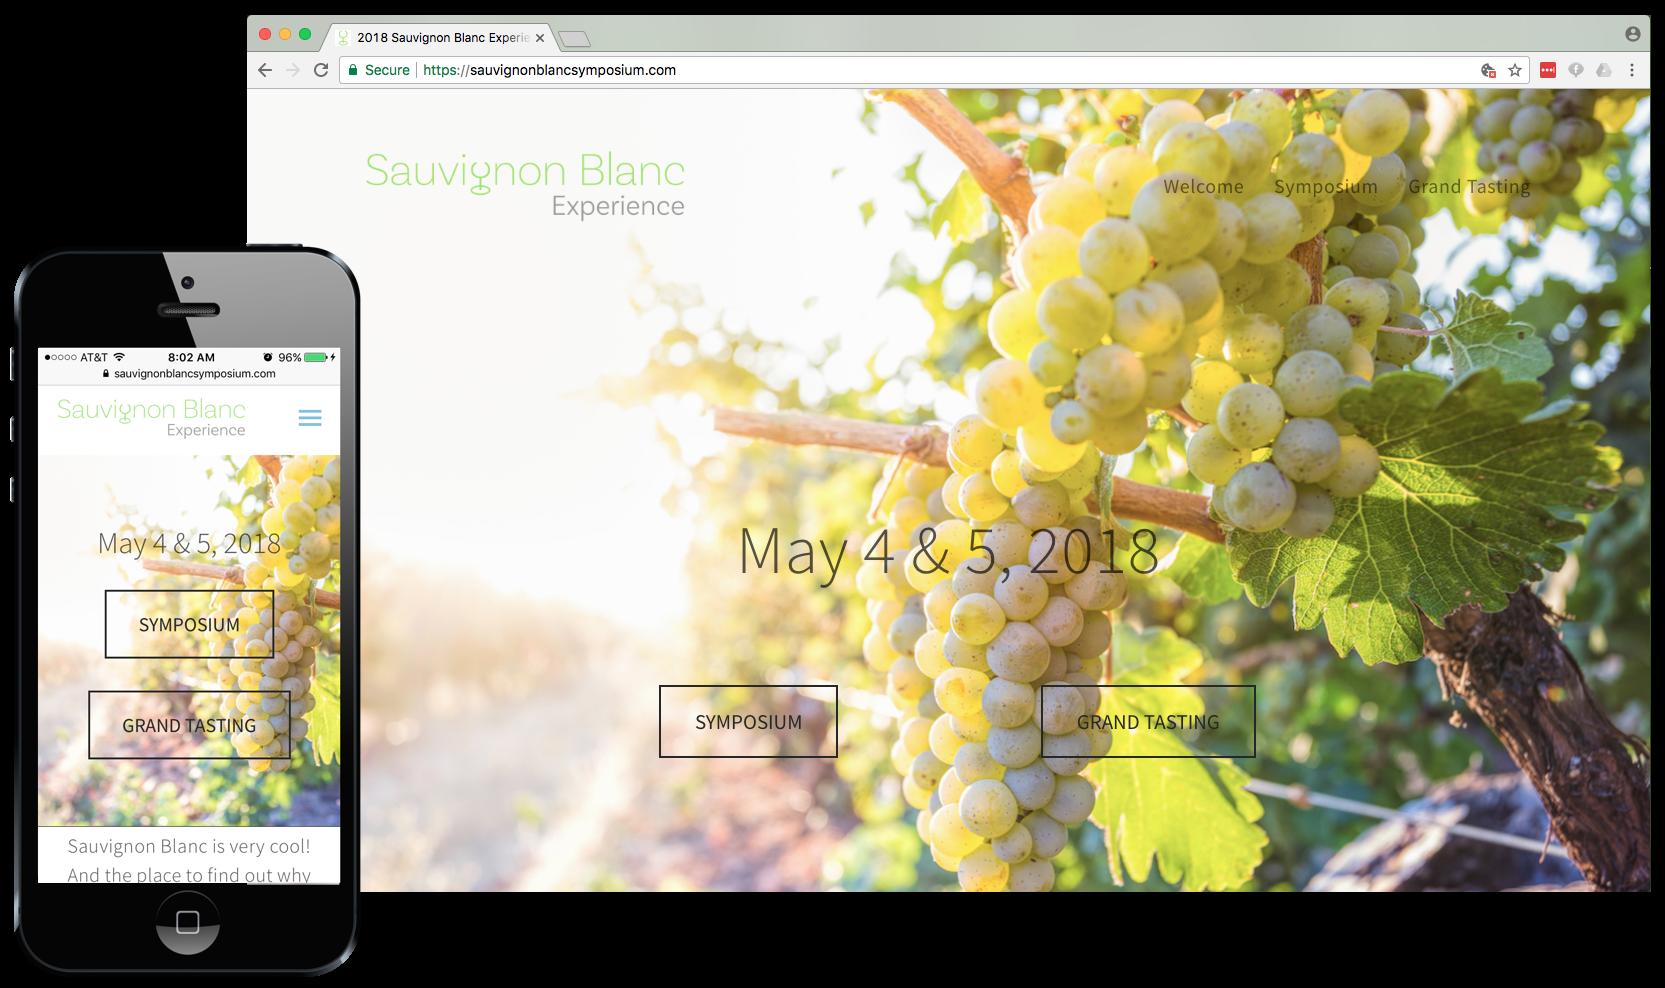 Sauvignon Blanc Experience website